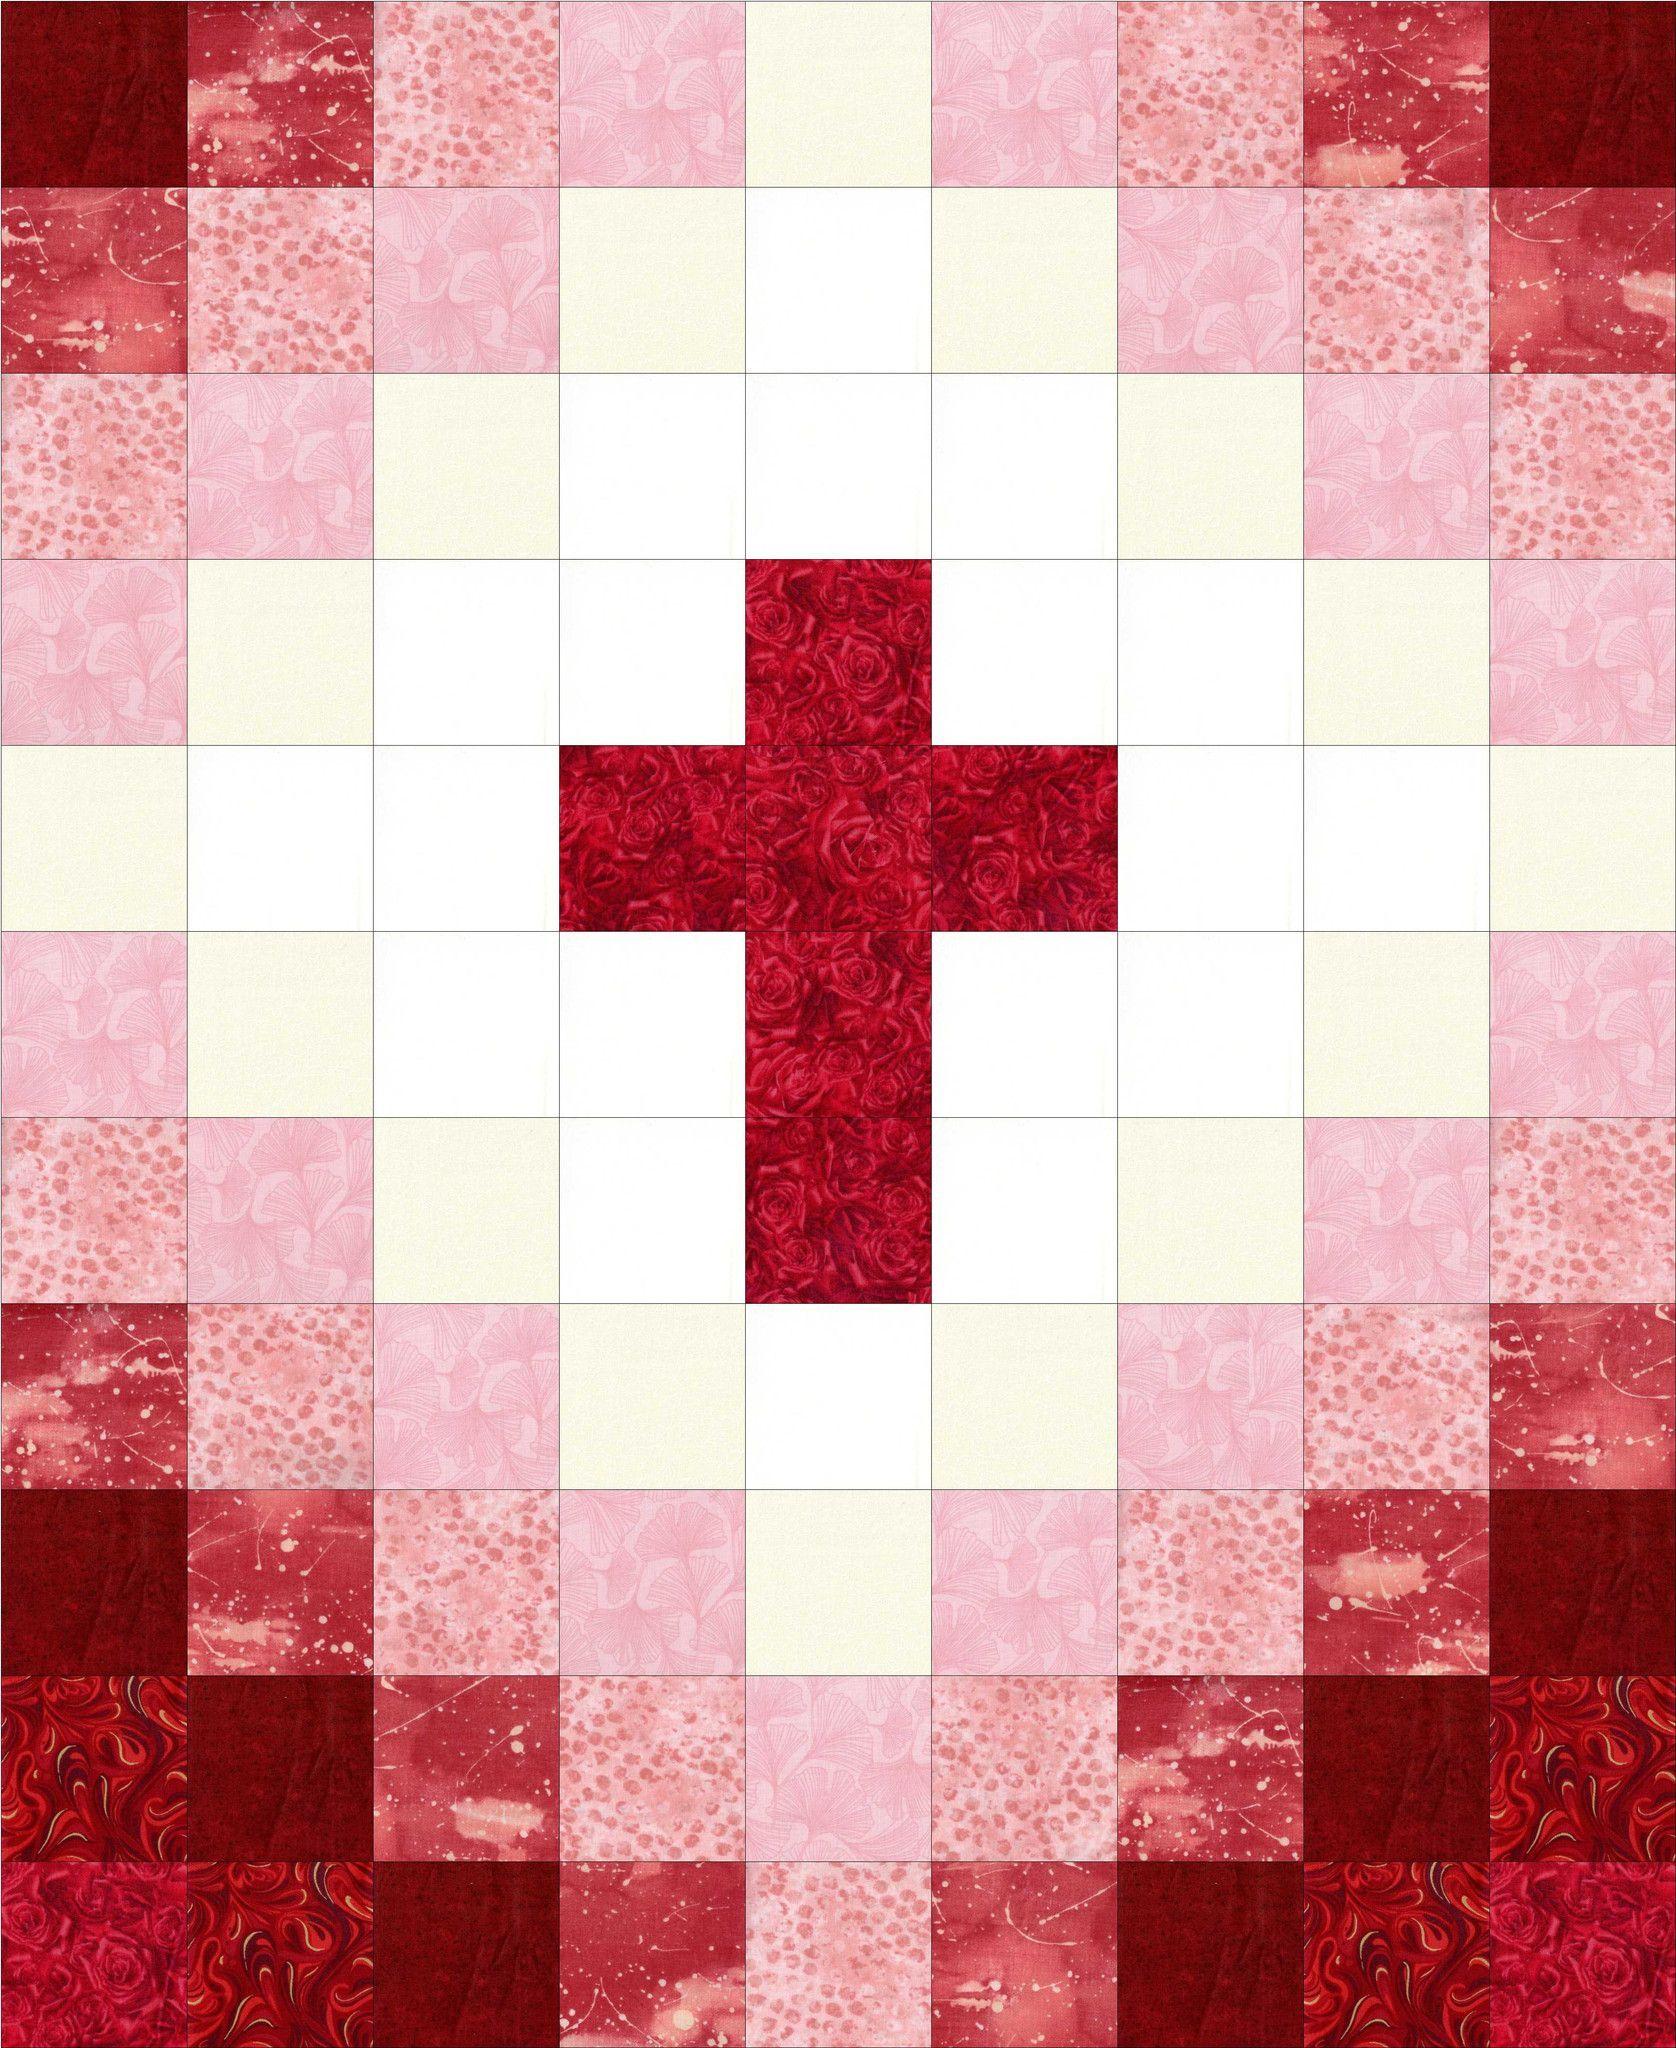 Cross Christian Red Easy Precut Quilt Kit Sewing Cross